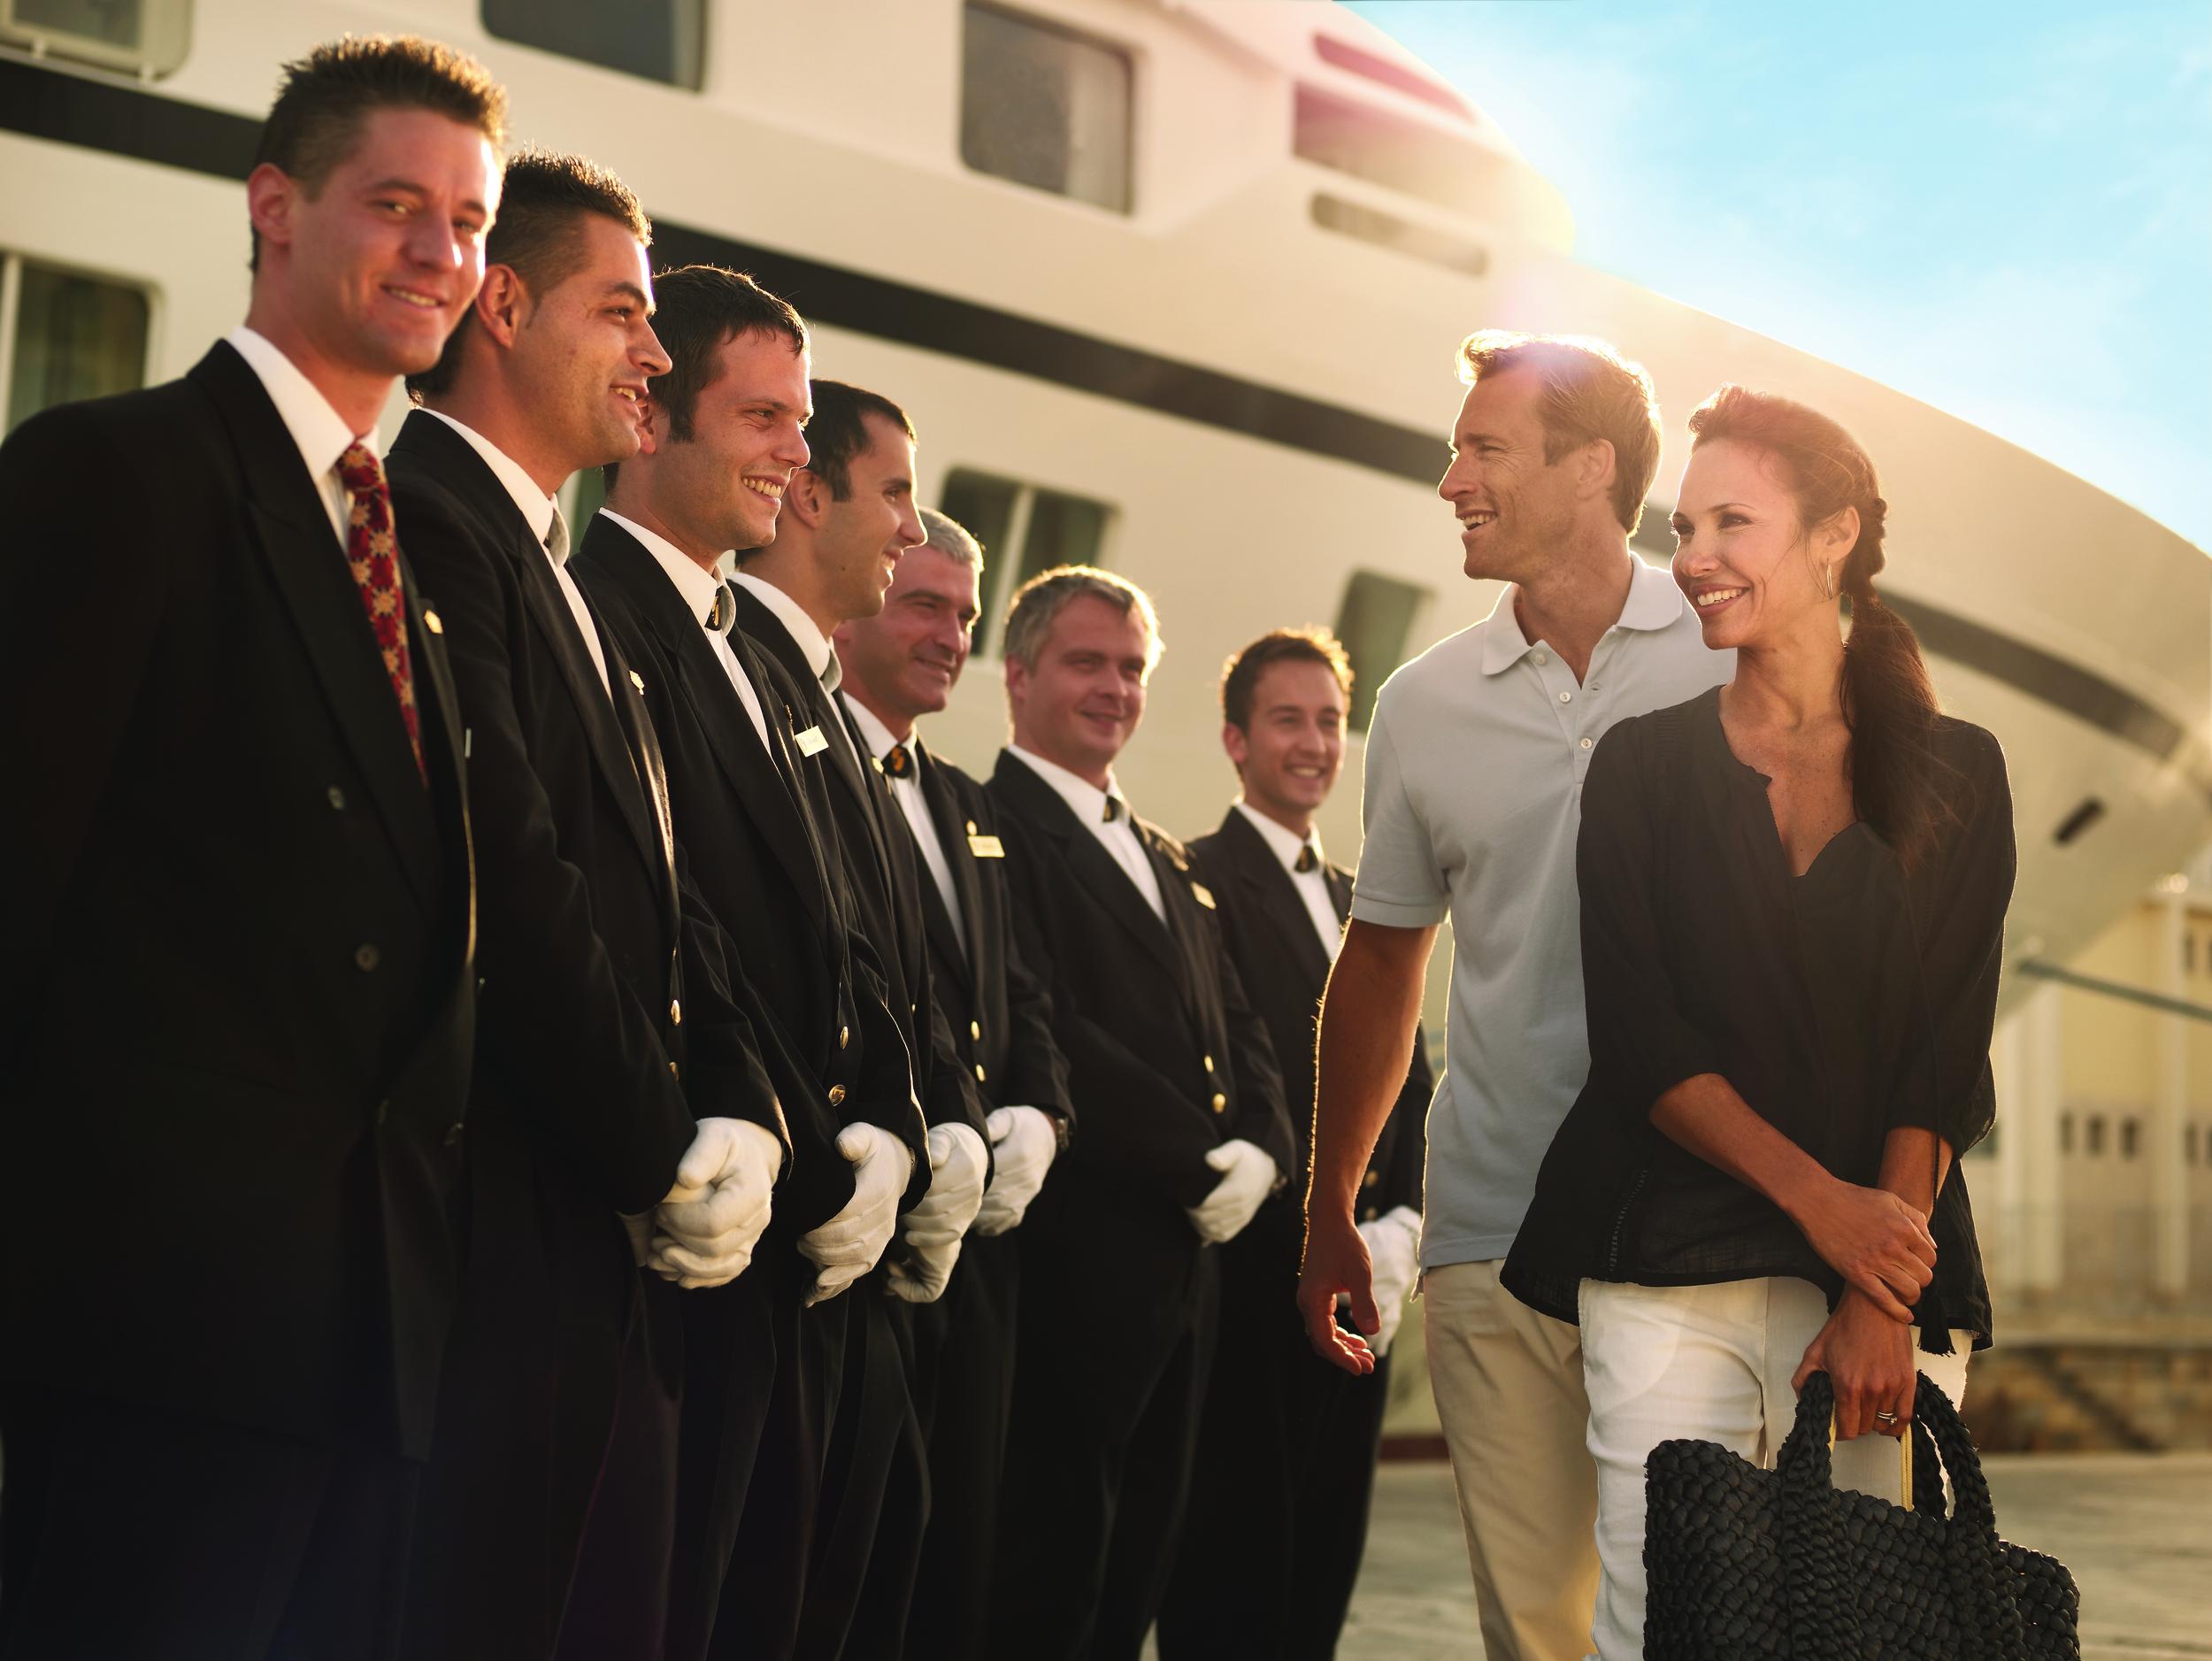 Welcome_Aboard_Seabourn_SX4FOzFCV5zwQe8z_gA8lMo_cmyk_l.jpg